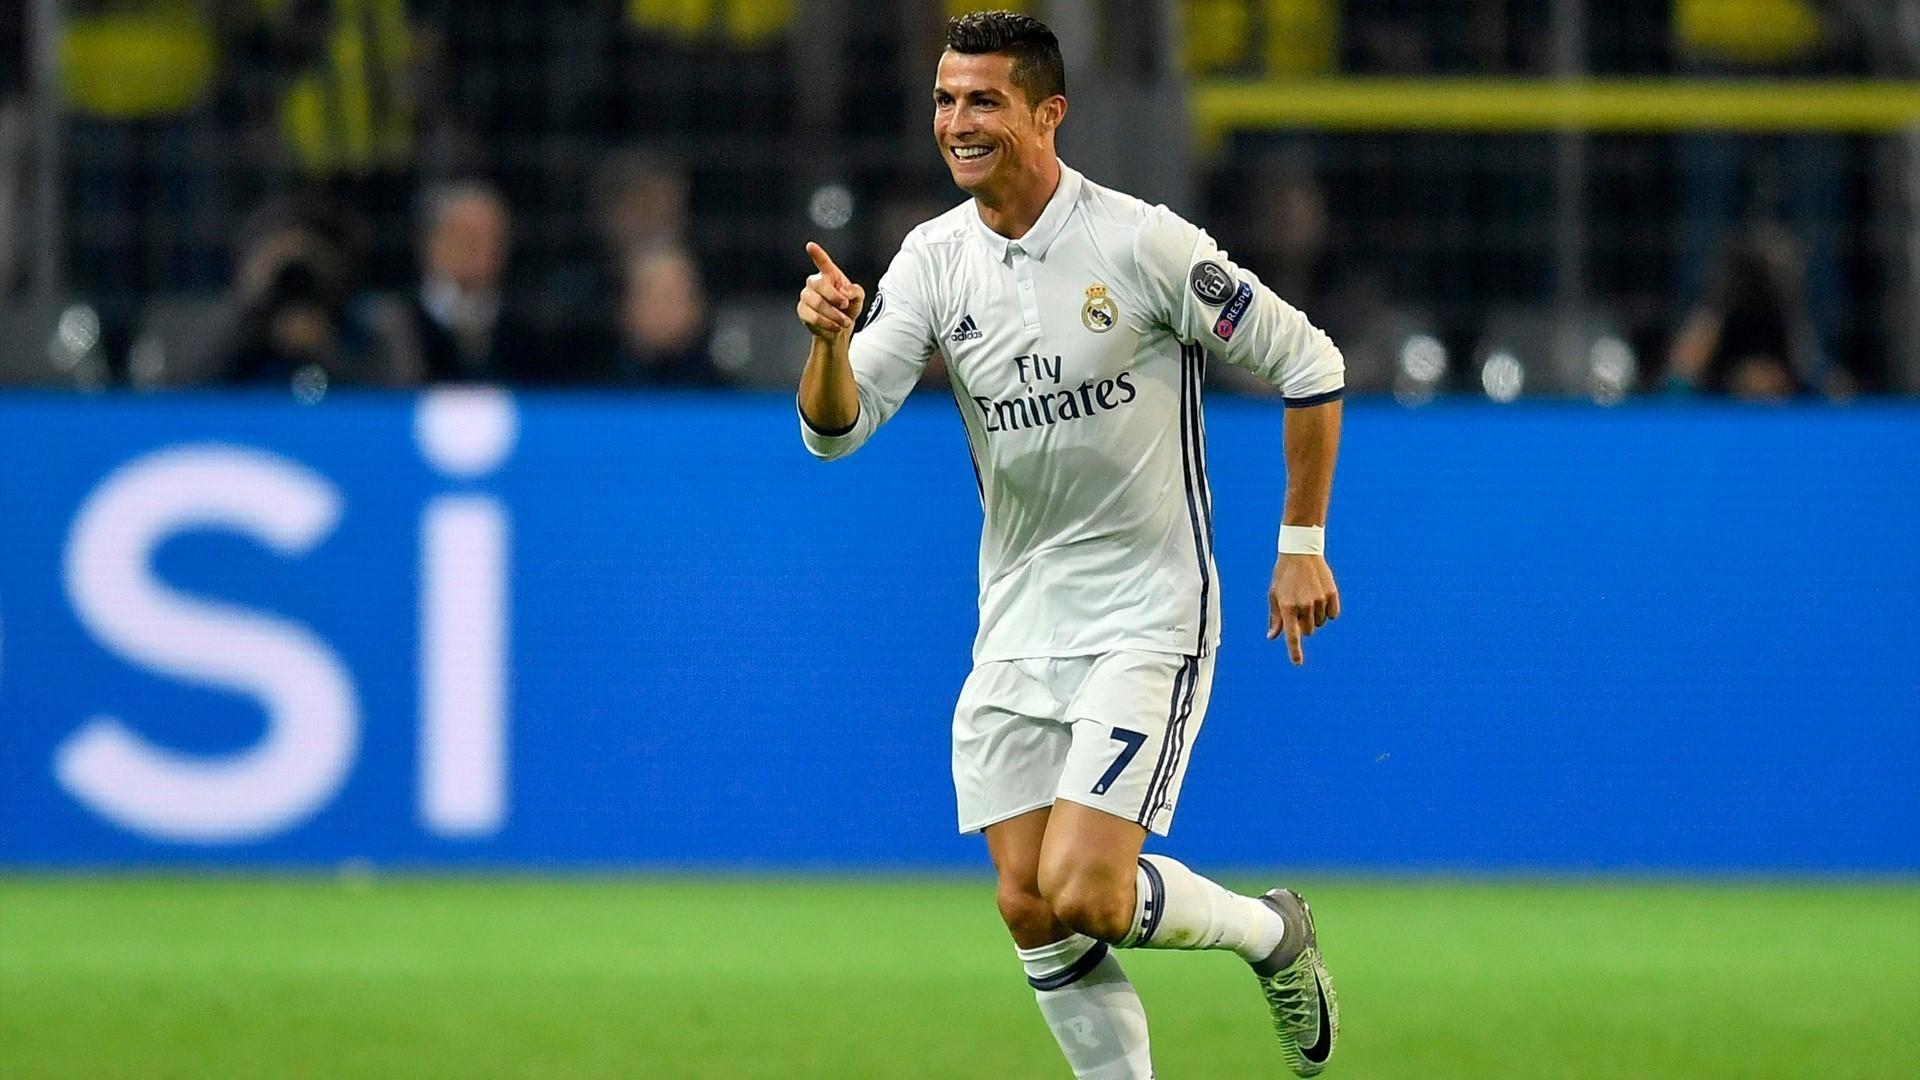 … Cristiano Ronaldo HD Wallpapers 201 …